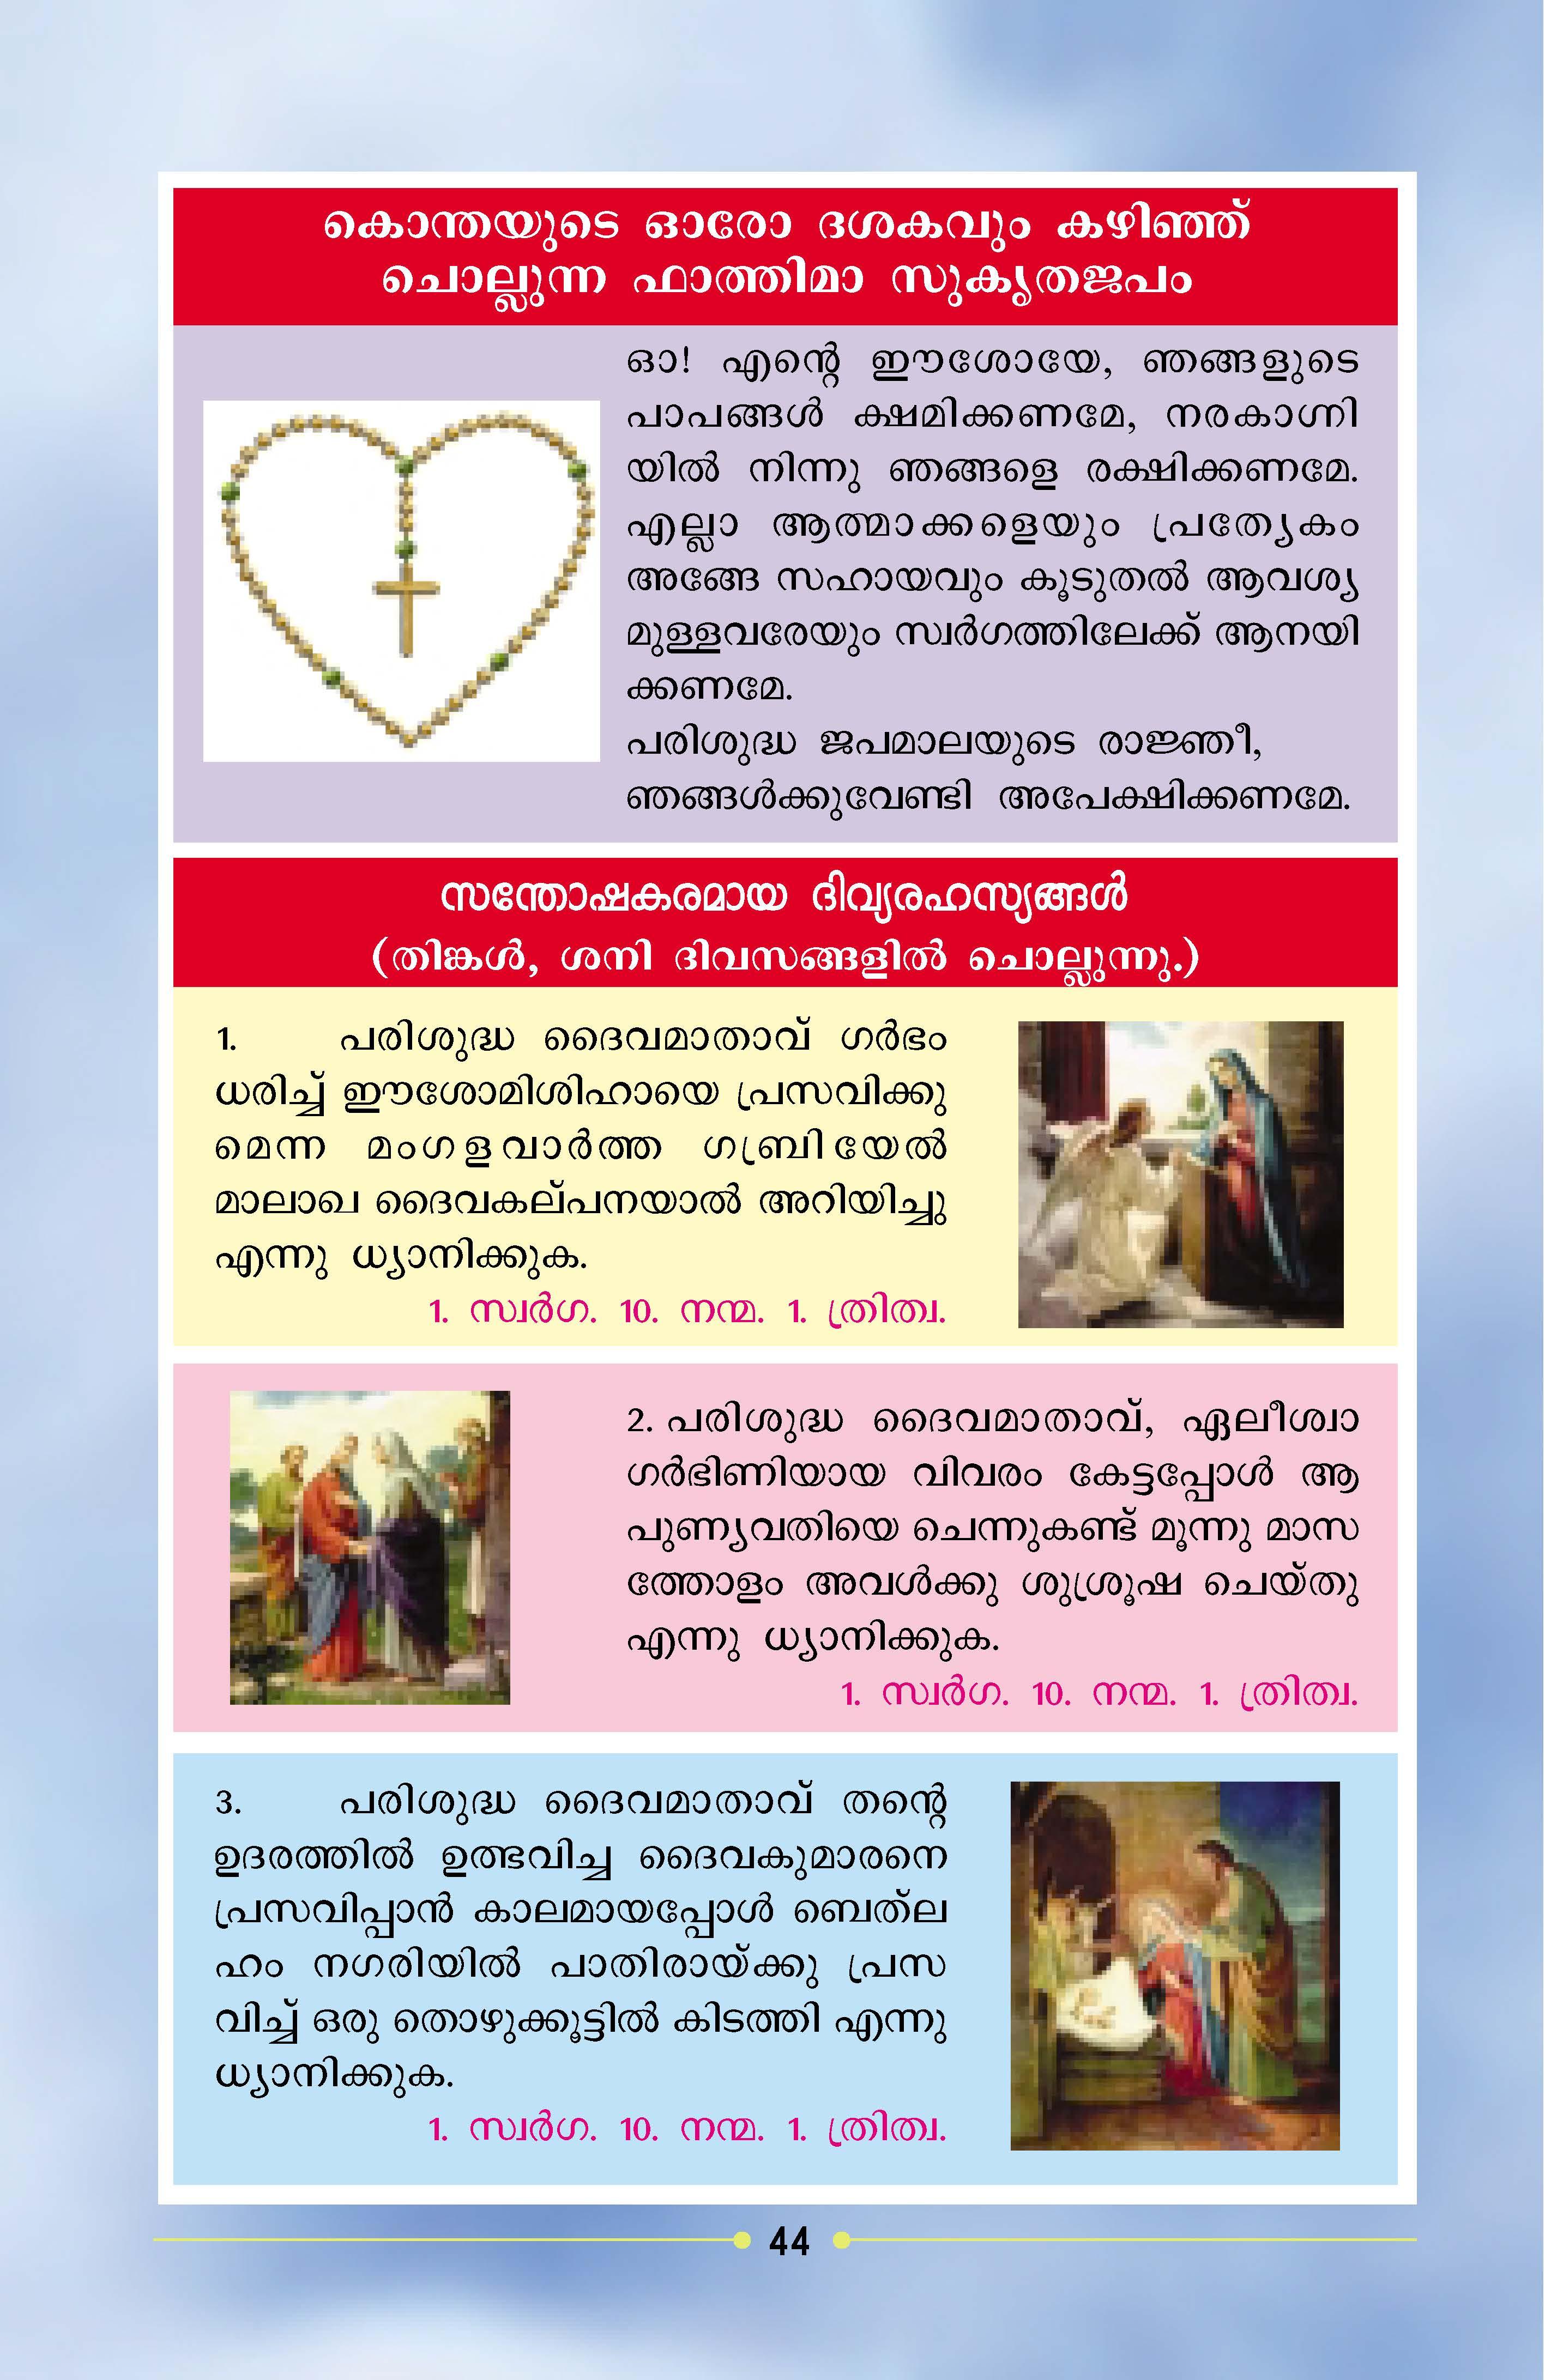 Holy Rosary Malayalam 02